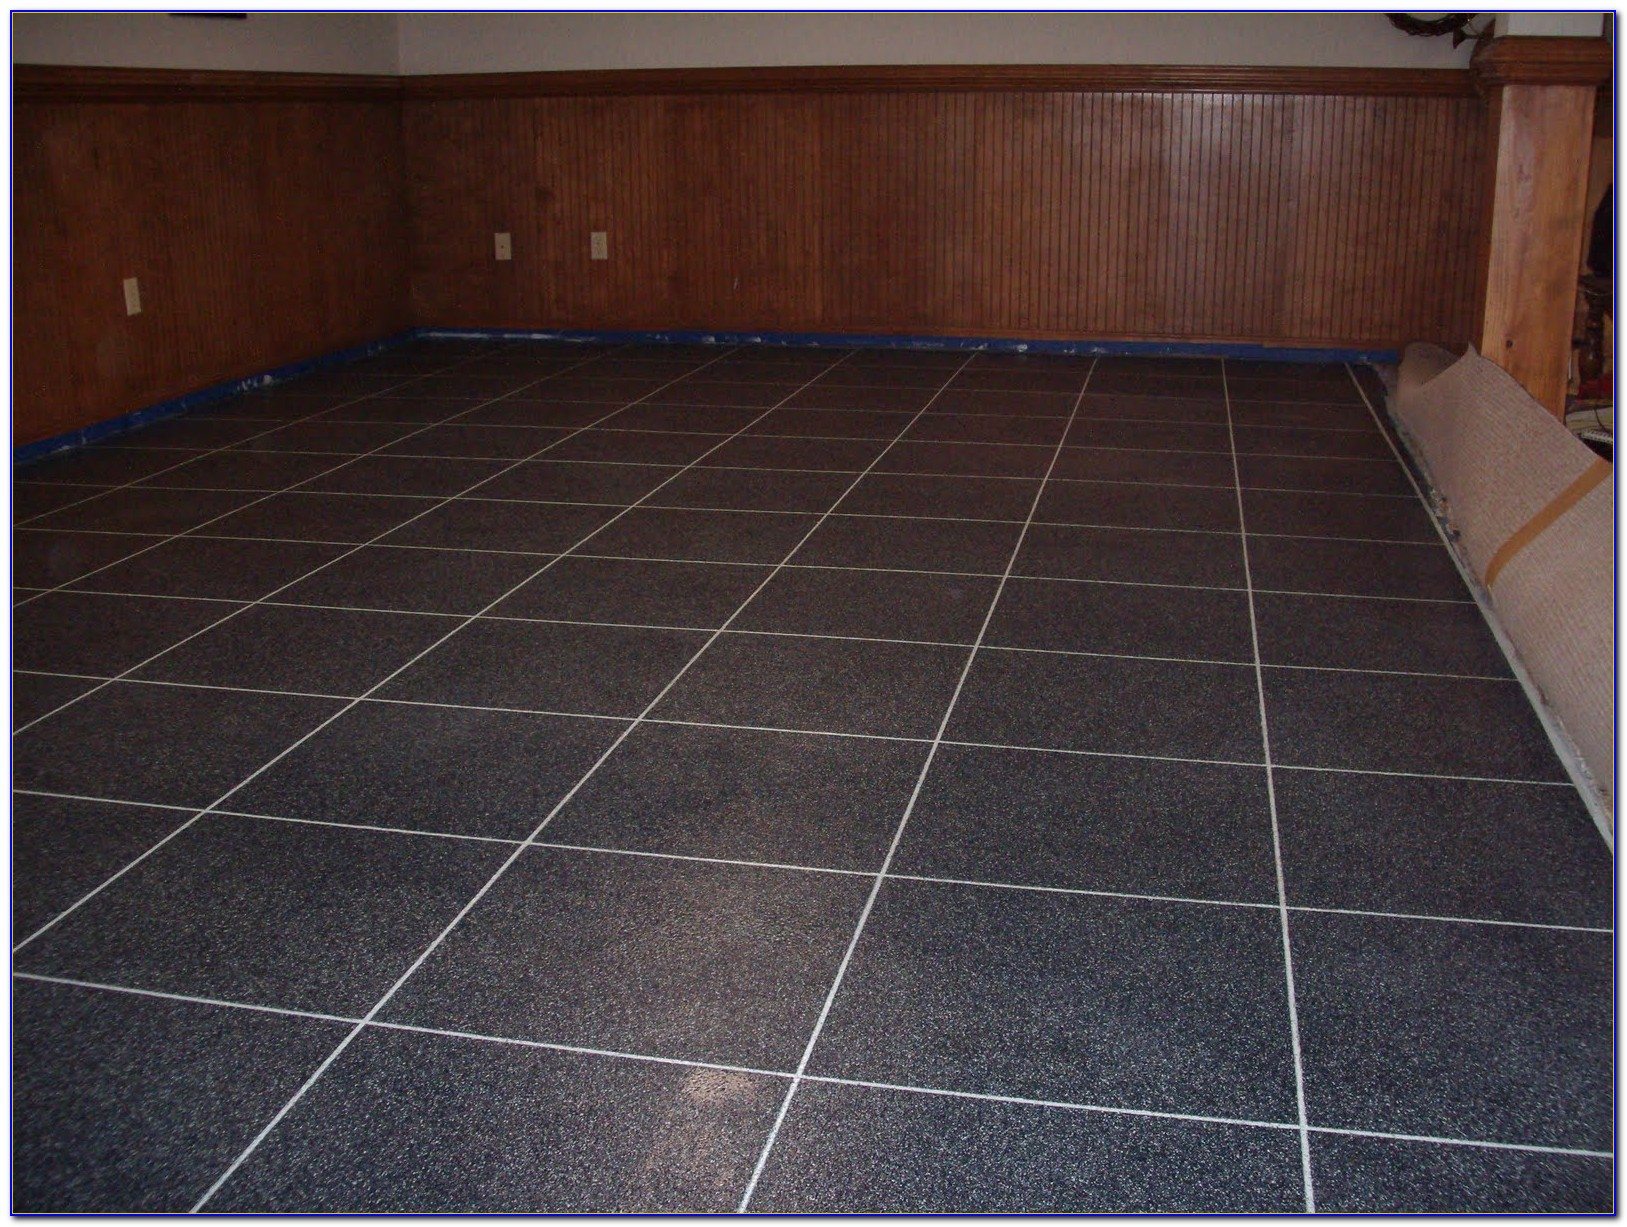 Moisture barrier for laminate flooring over wood subfloor for Hardwood floors humidity